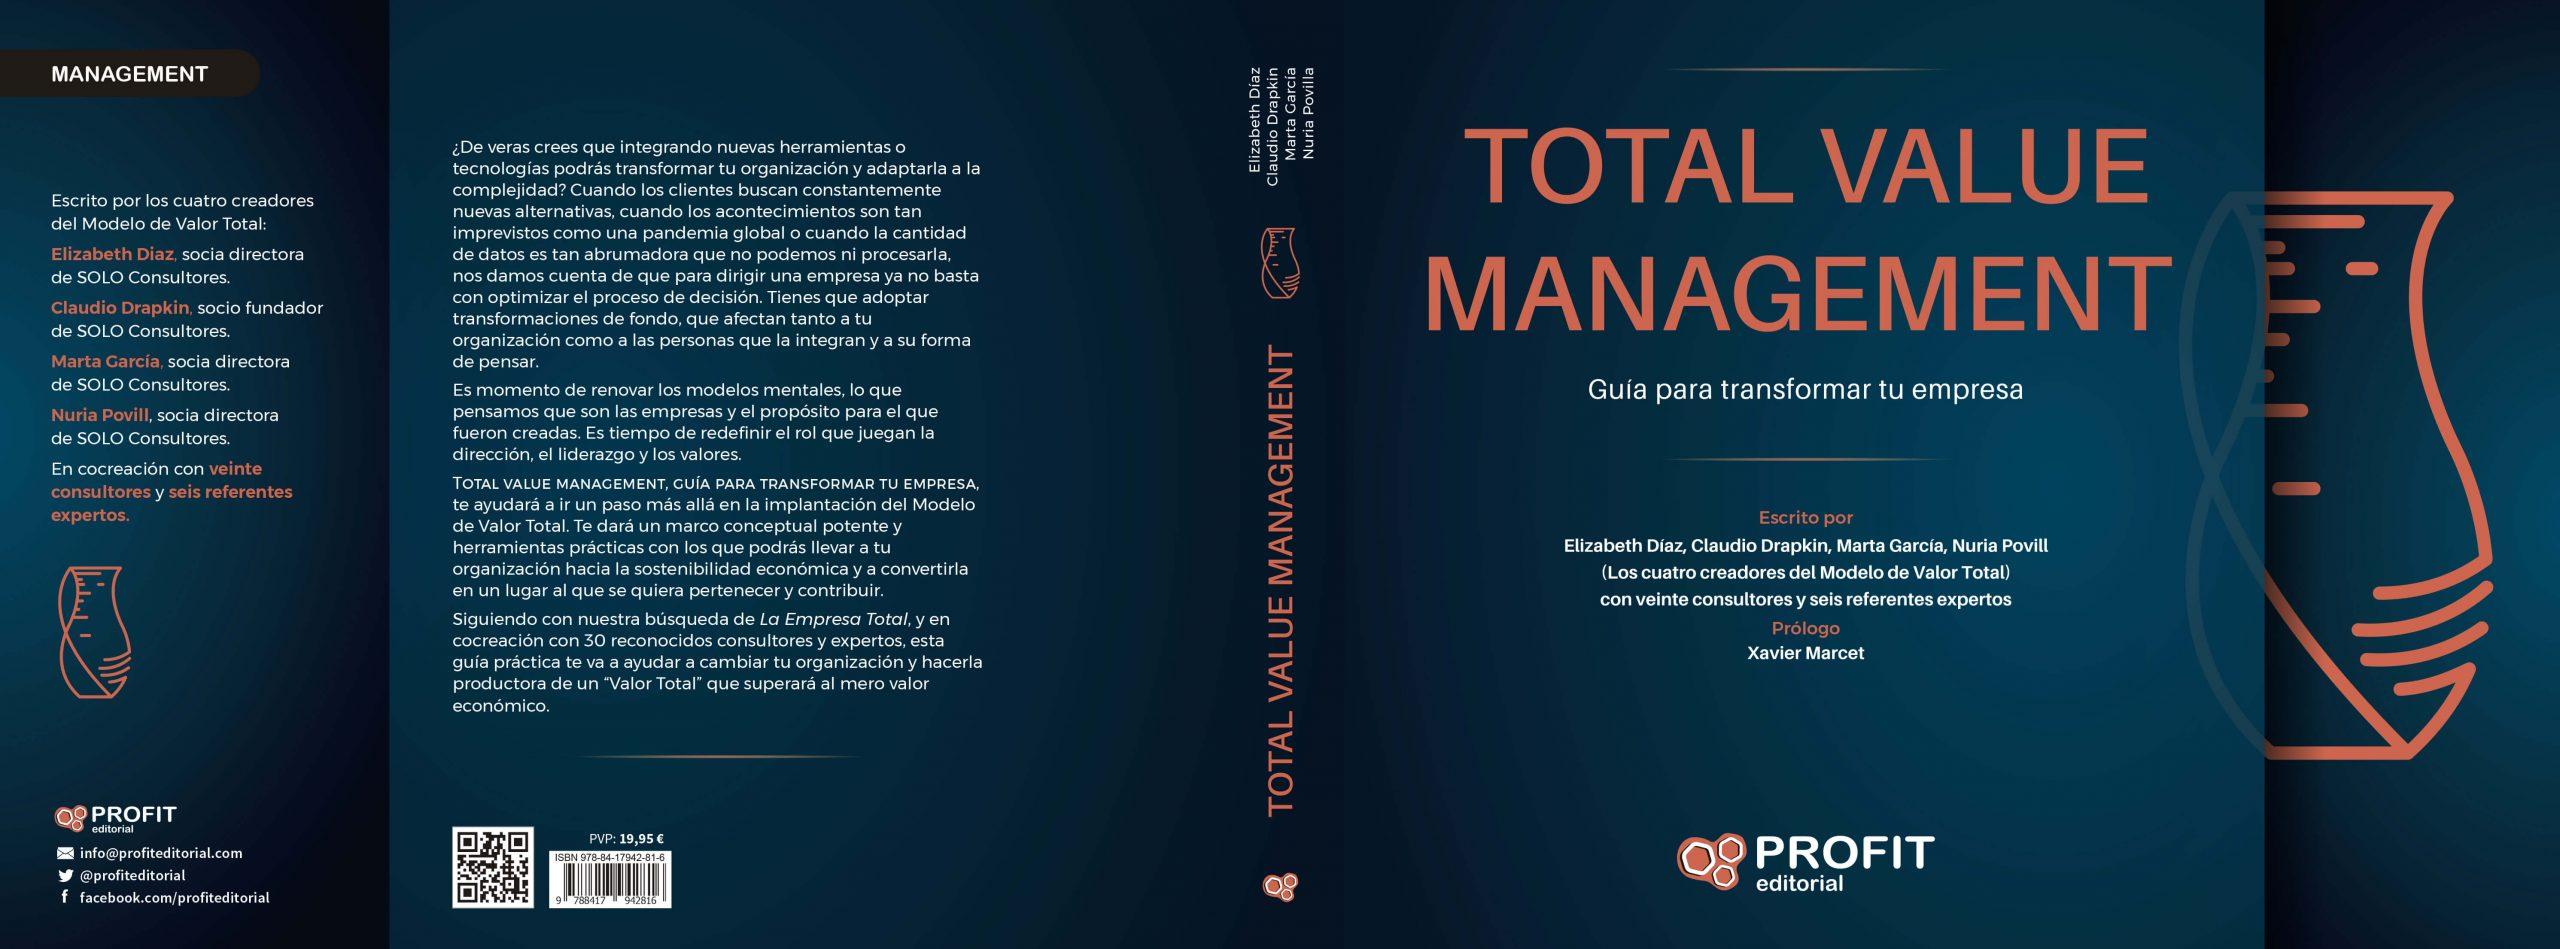 Total Value Management